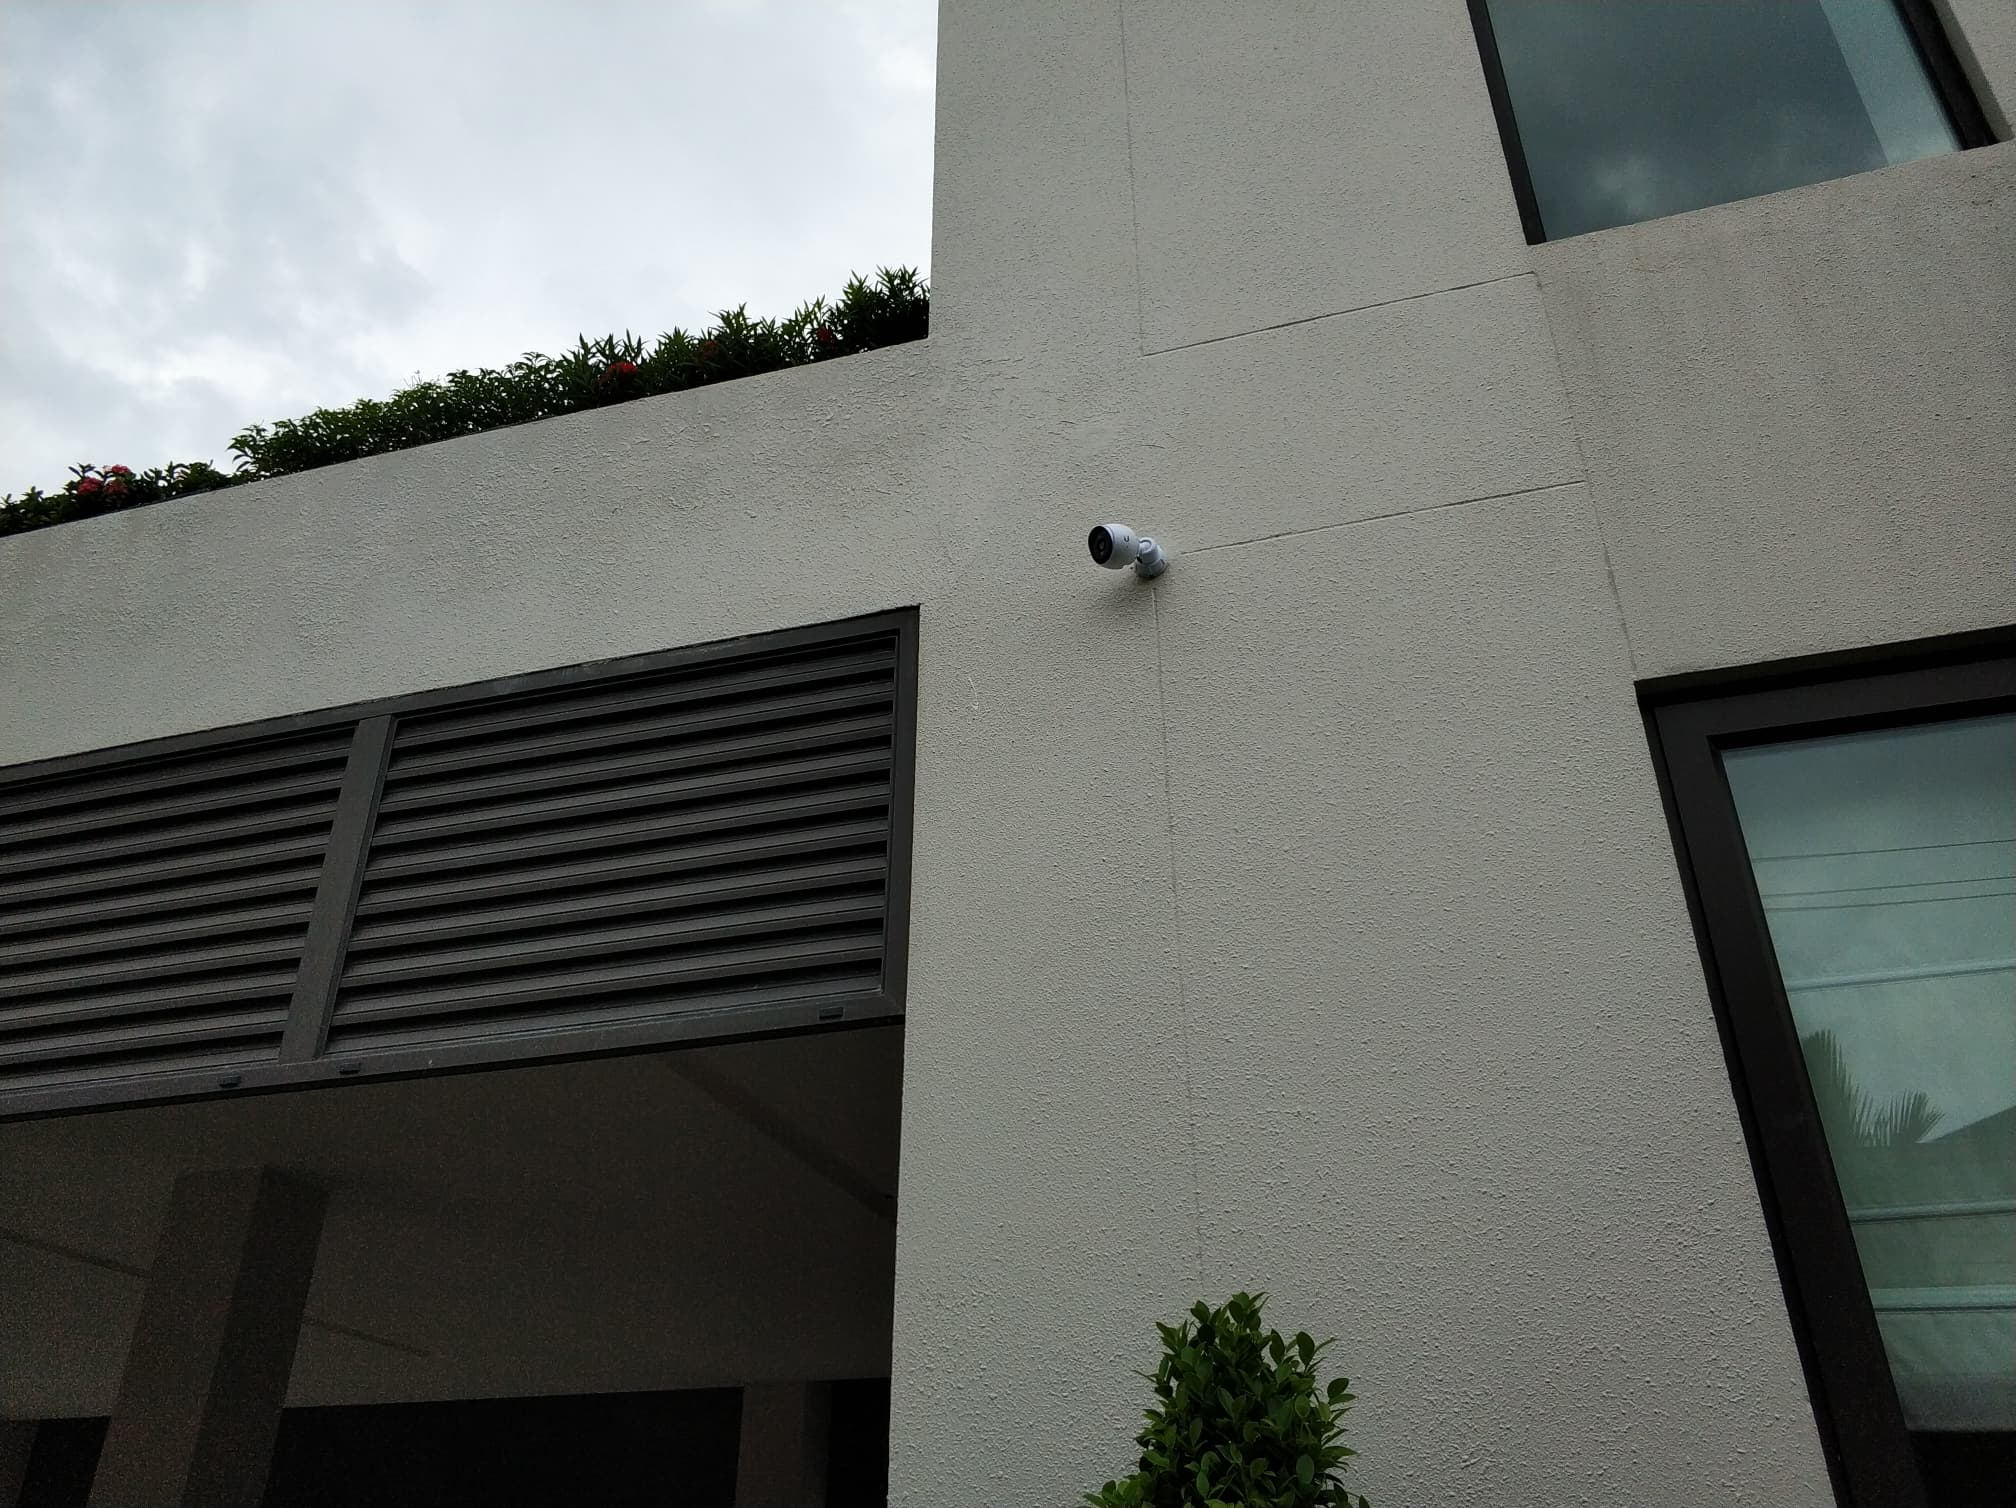 Ubiquiti CCTV Camera mounted to external wall.